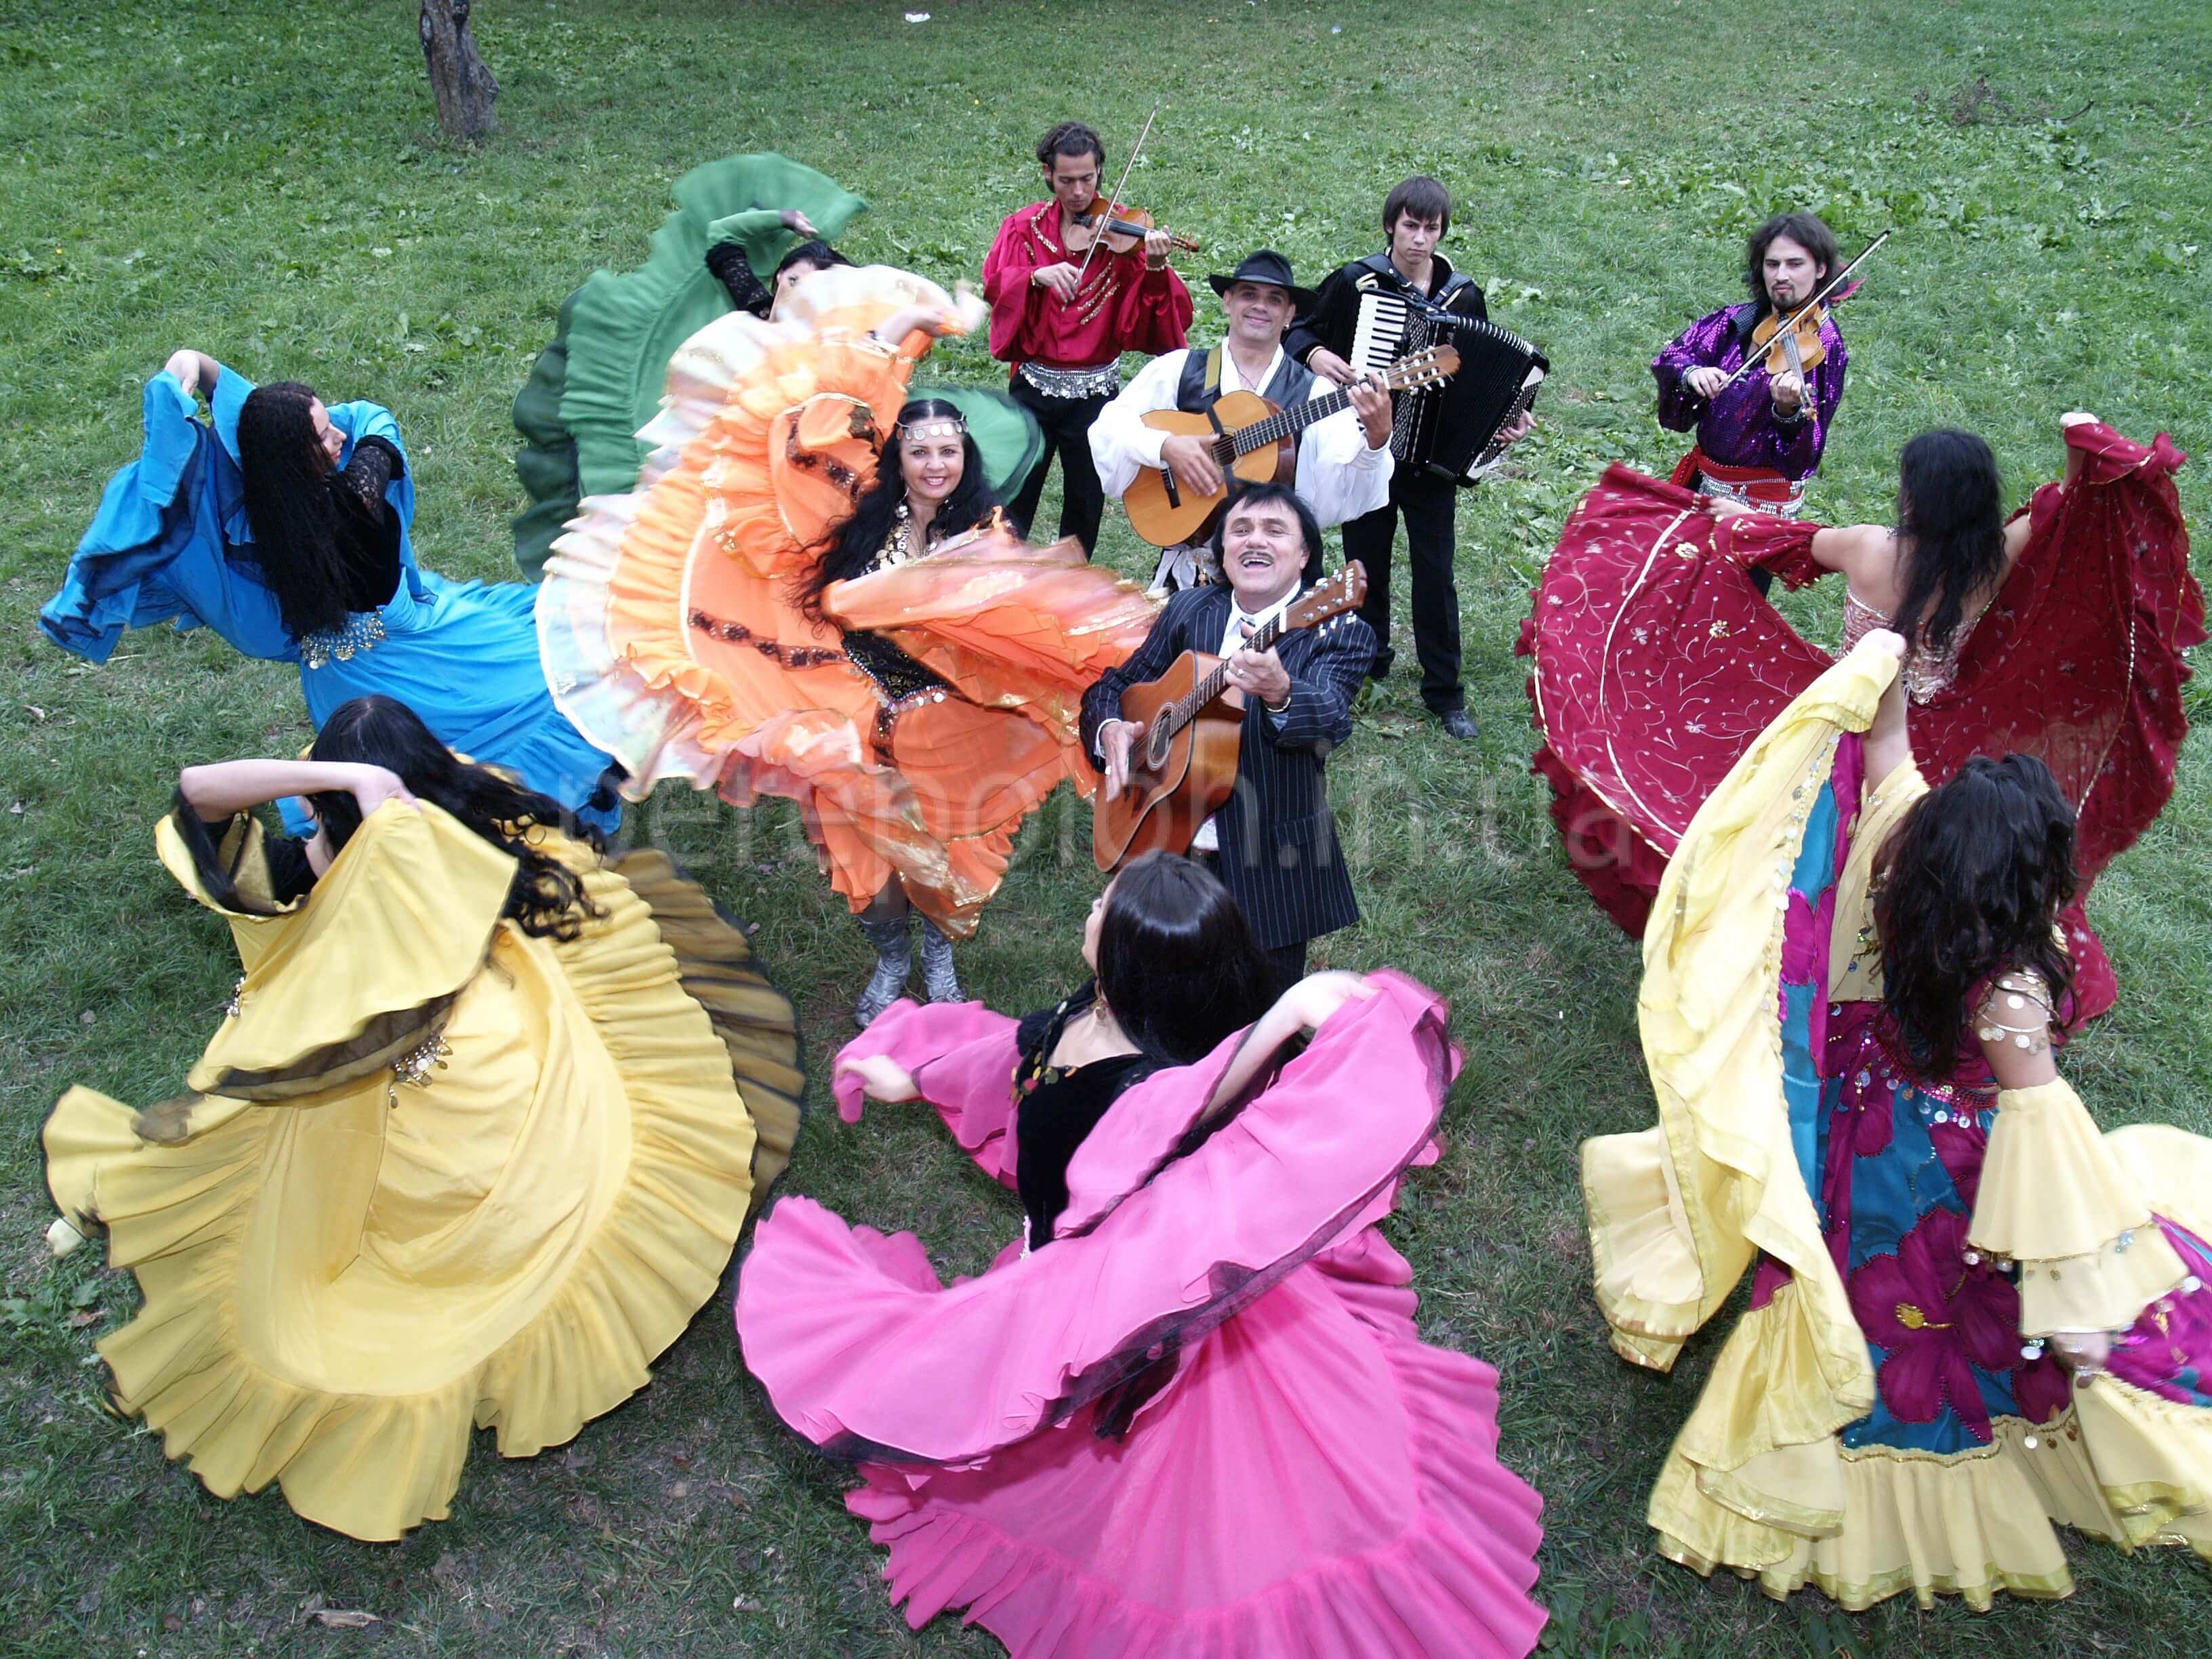 цыгане, цыганский танец, романс